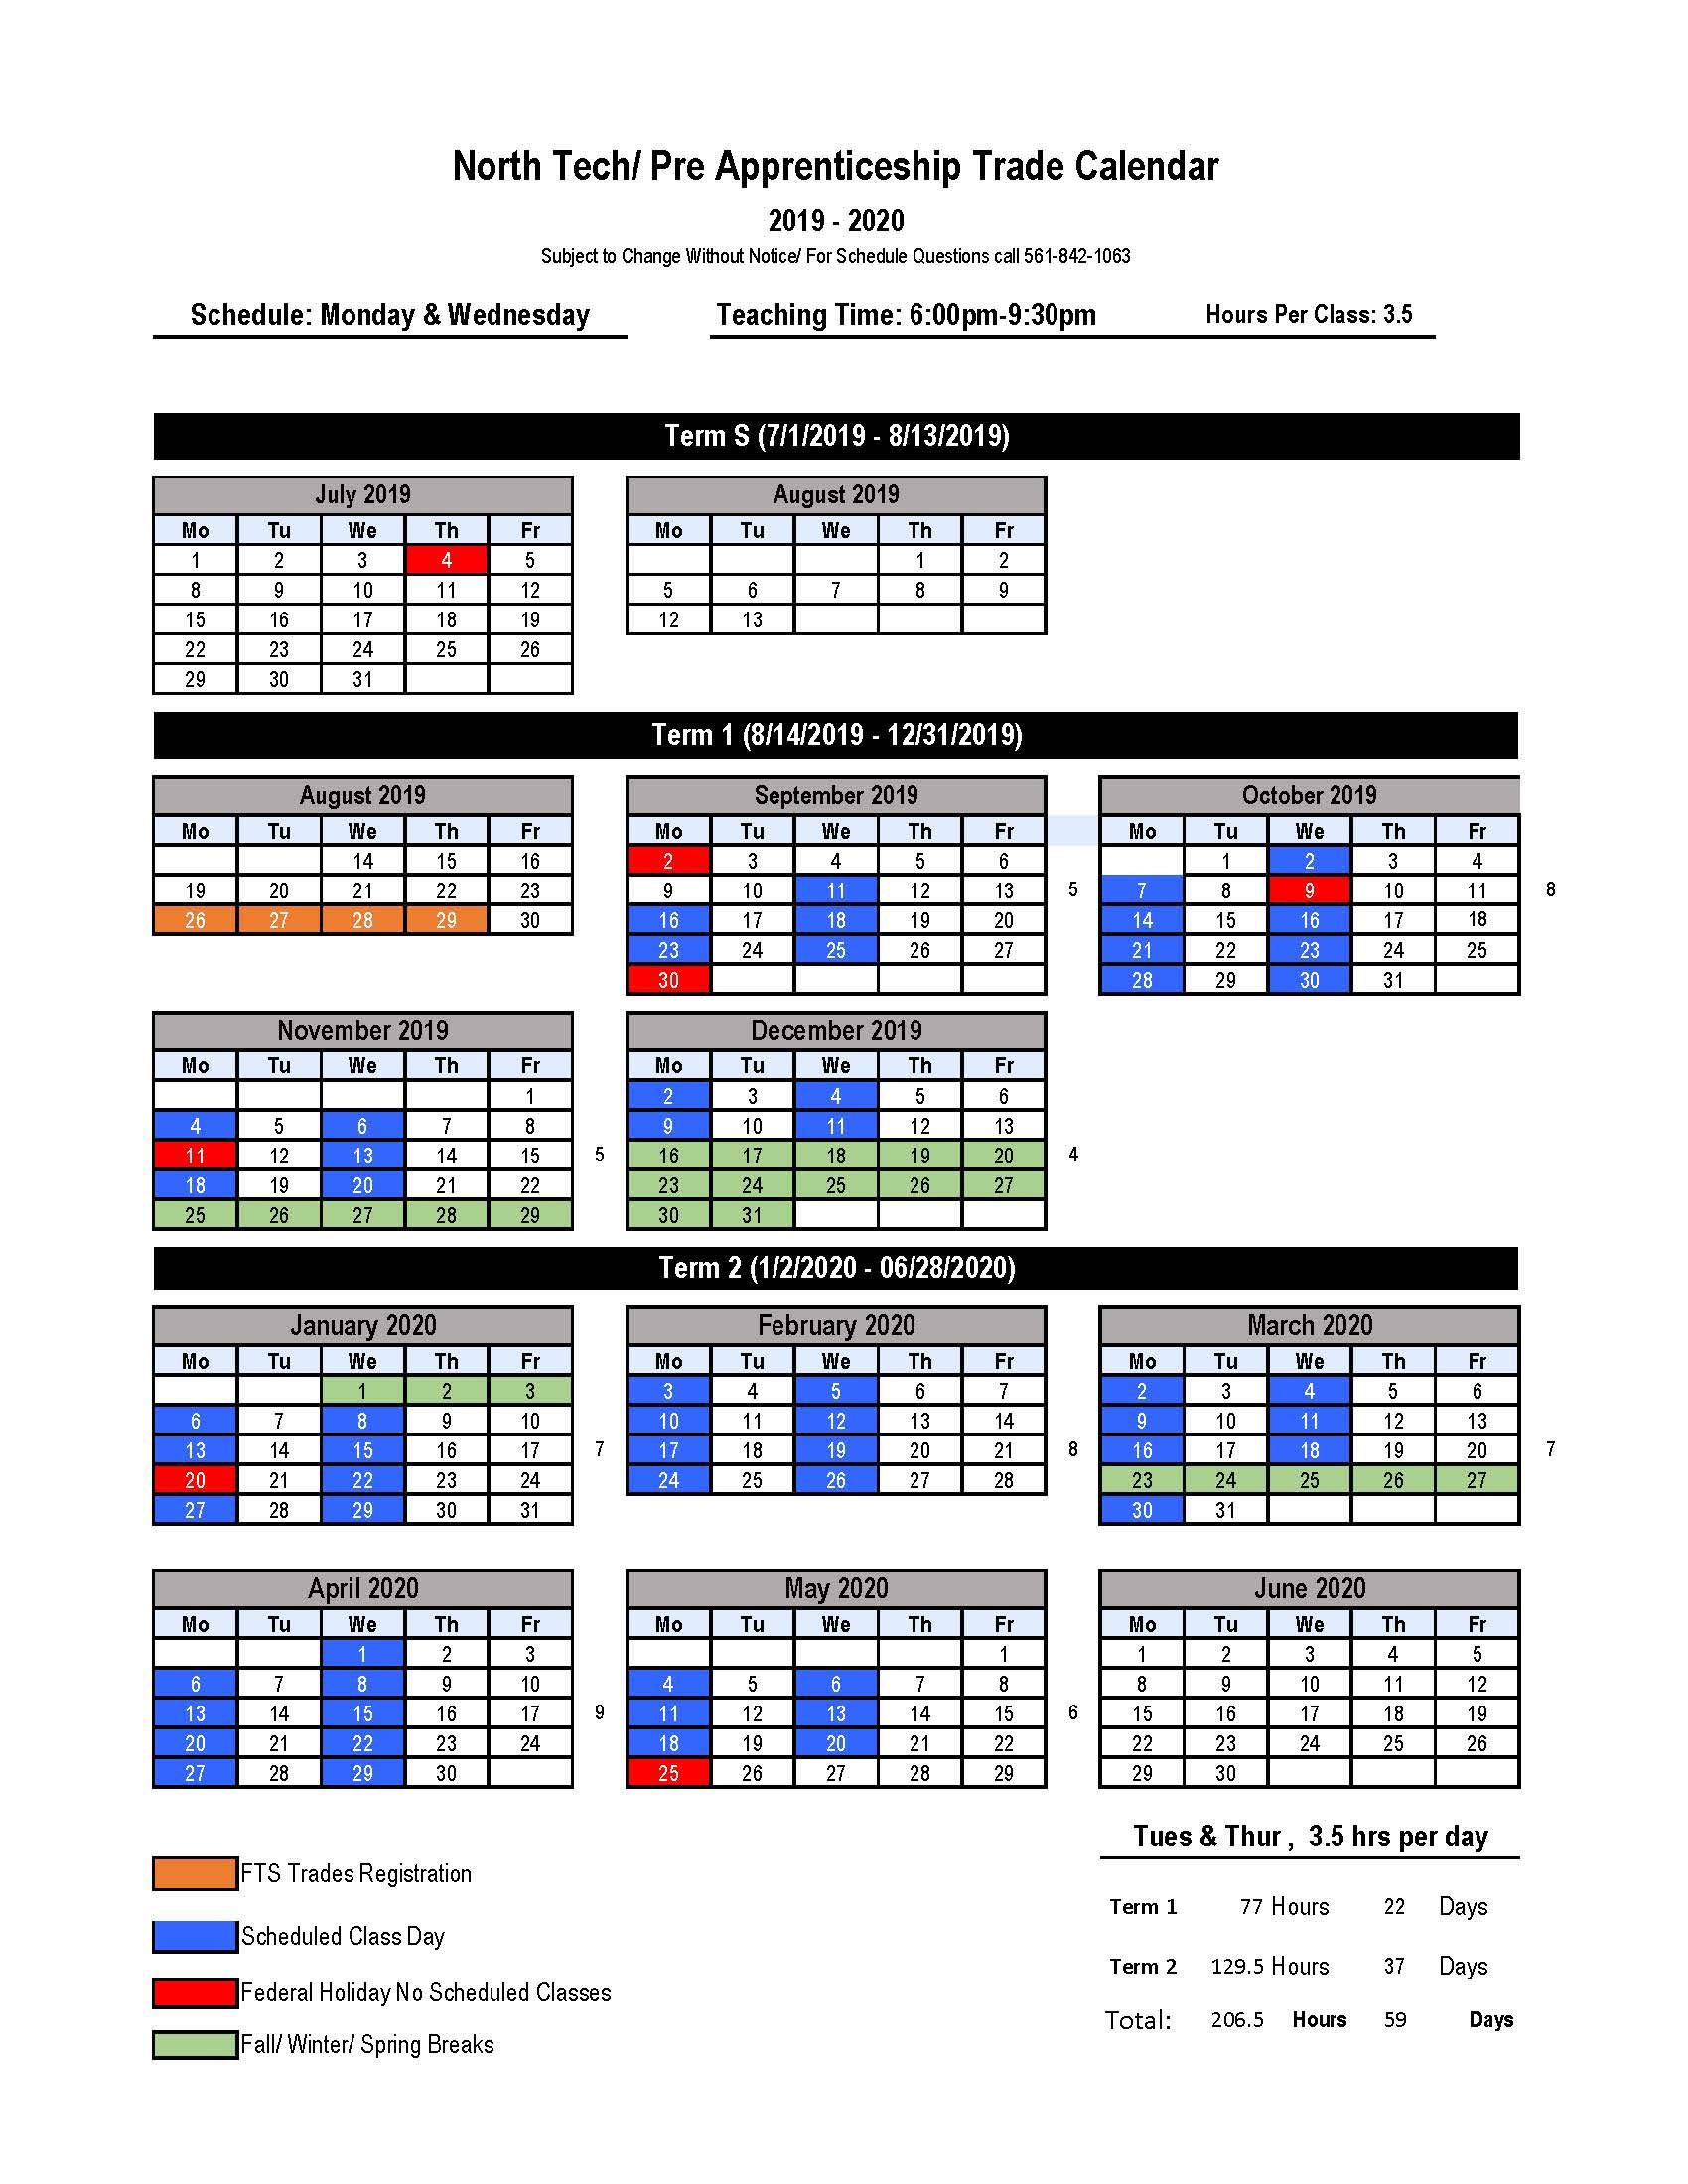 North Tech 2019-2020 Calendar